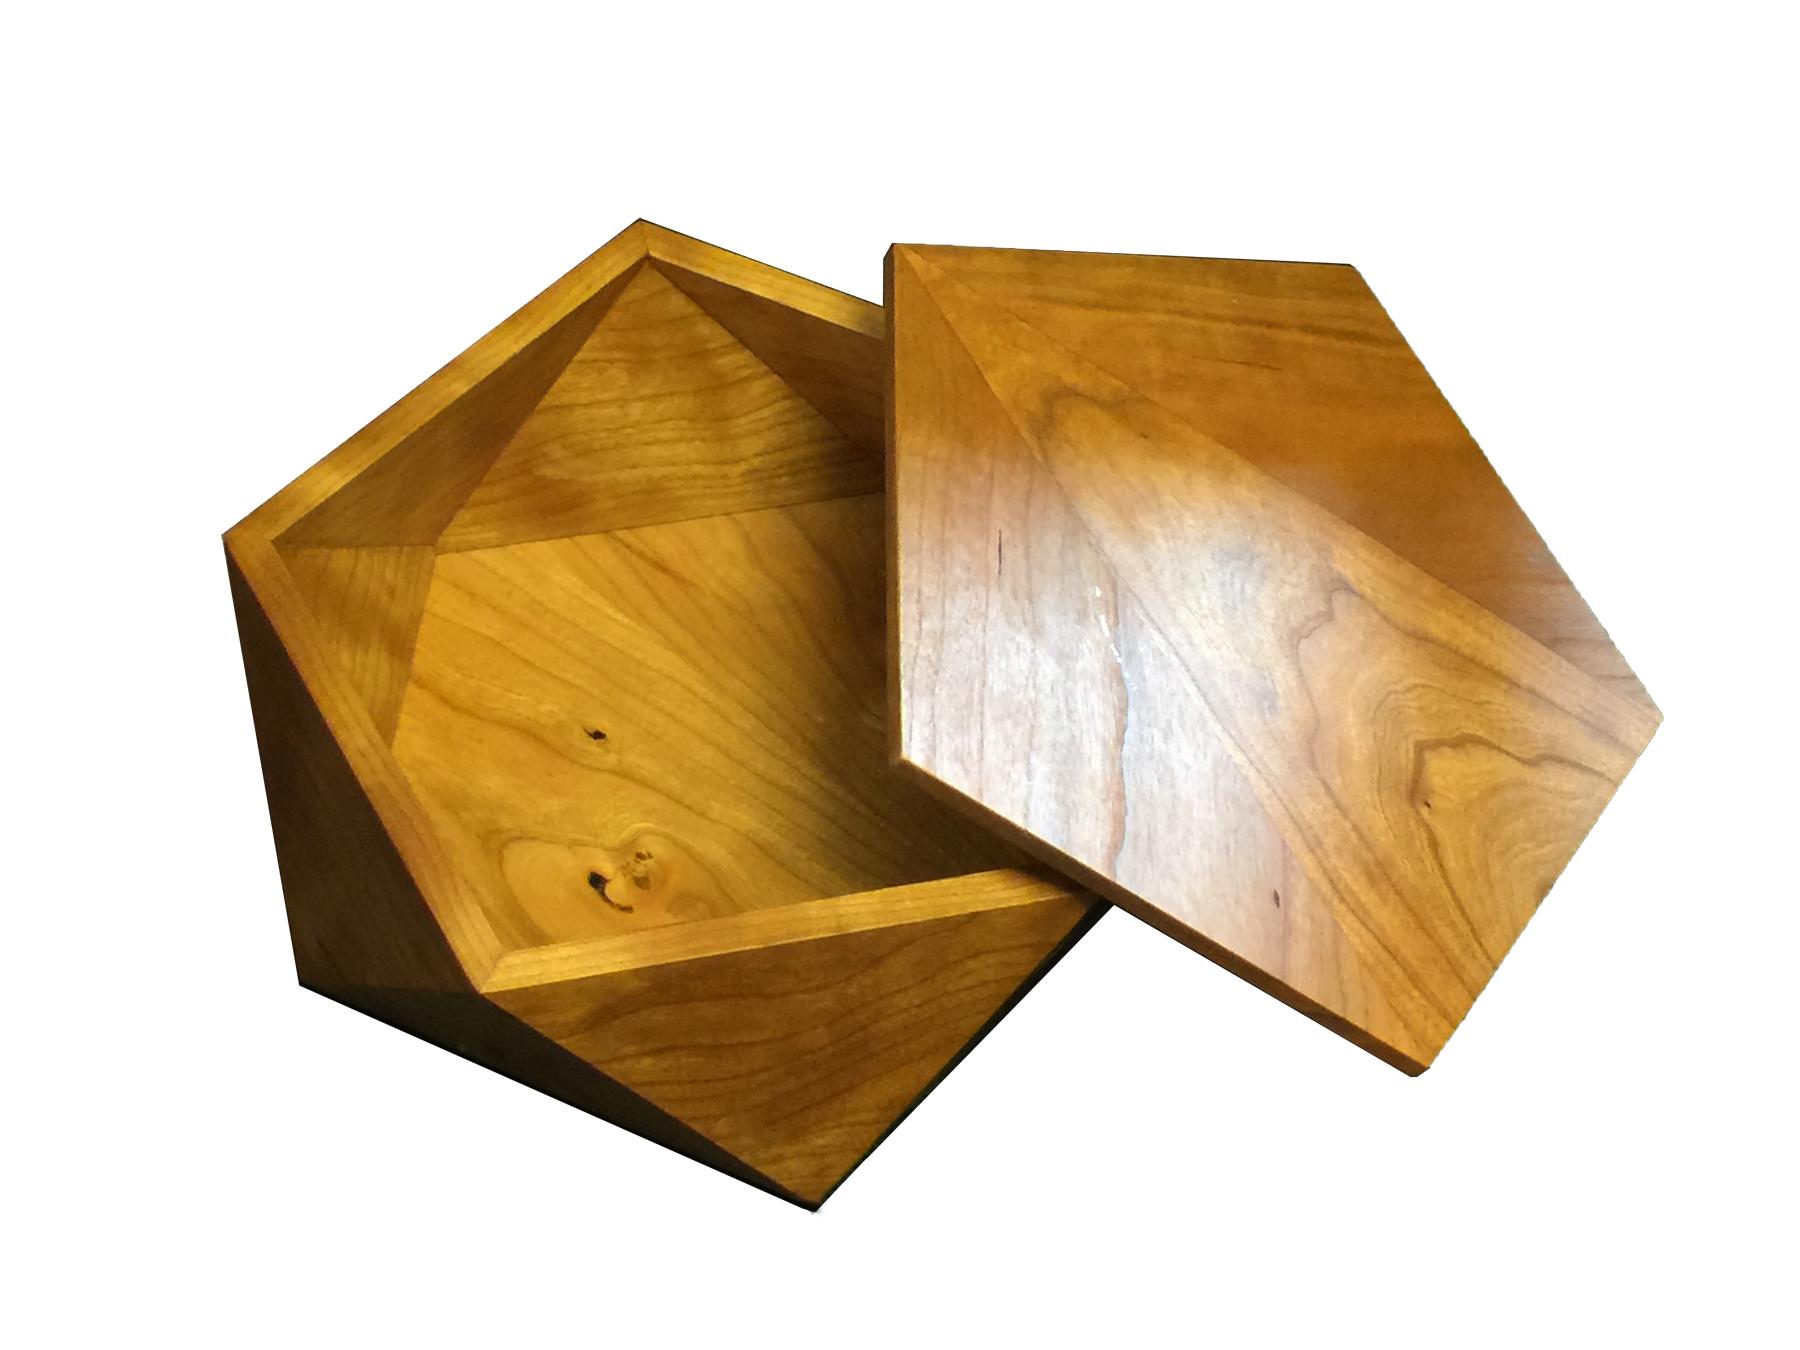 Pentagonal Box - Cherry